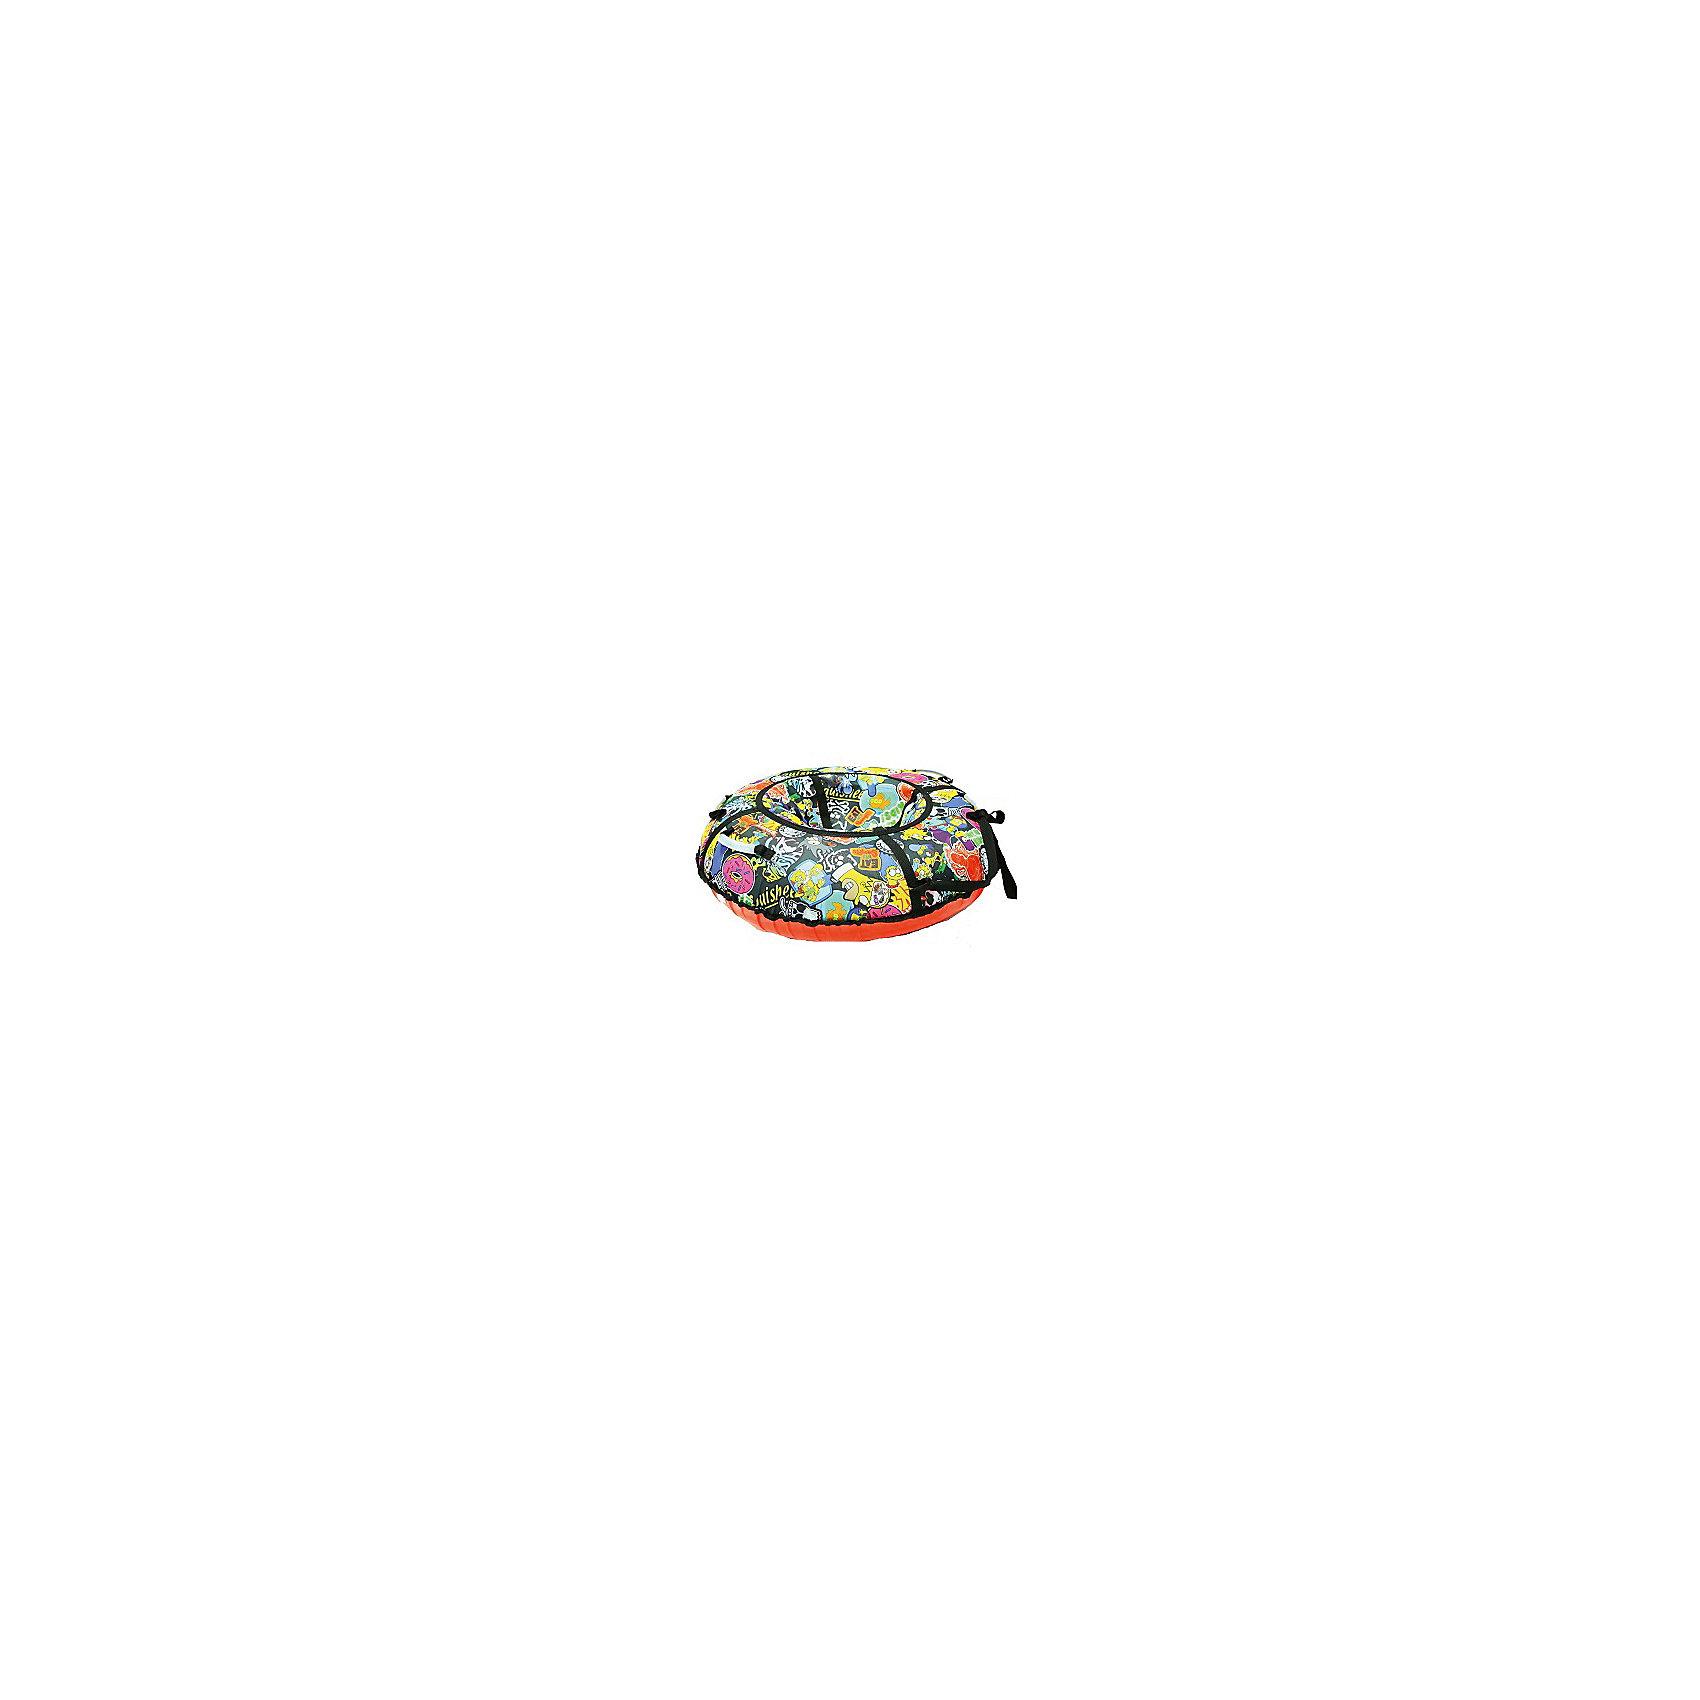 Hubster Тюбинг Люкс Симпсоны 90, Hubster светильник asd nrlp eco 1445 14w 160 260v 4000к white 4690612004365